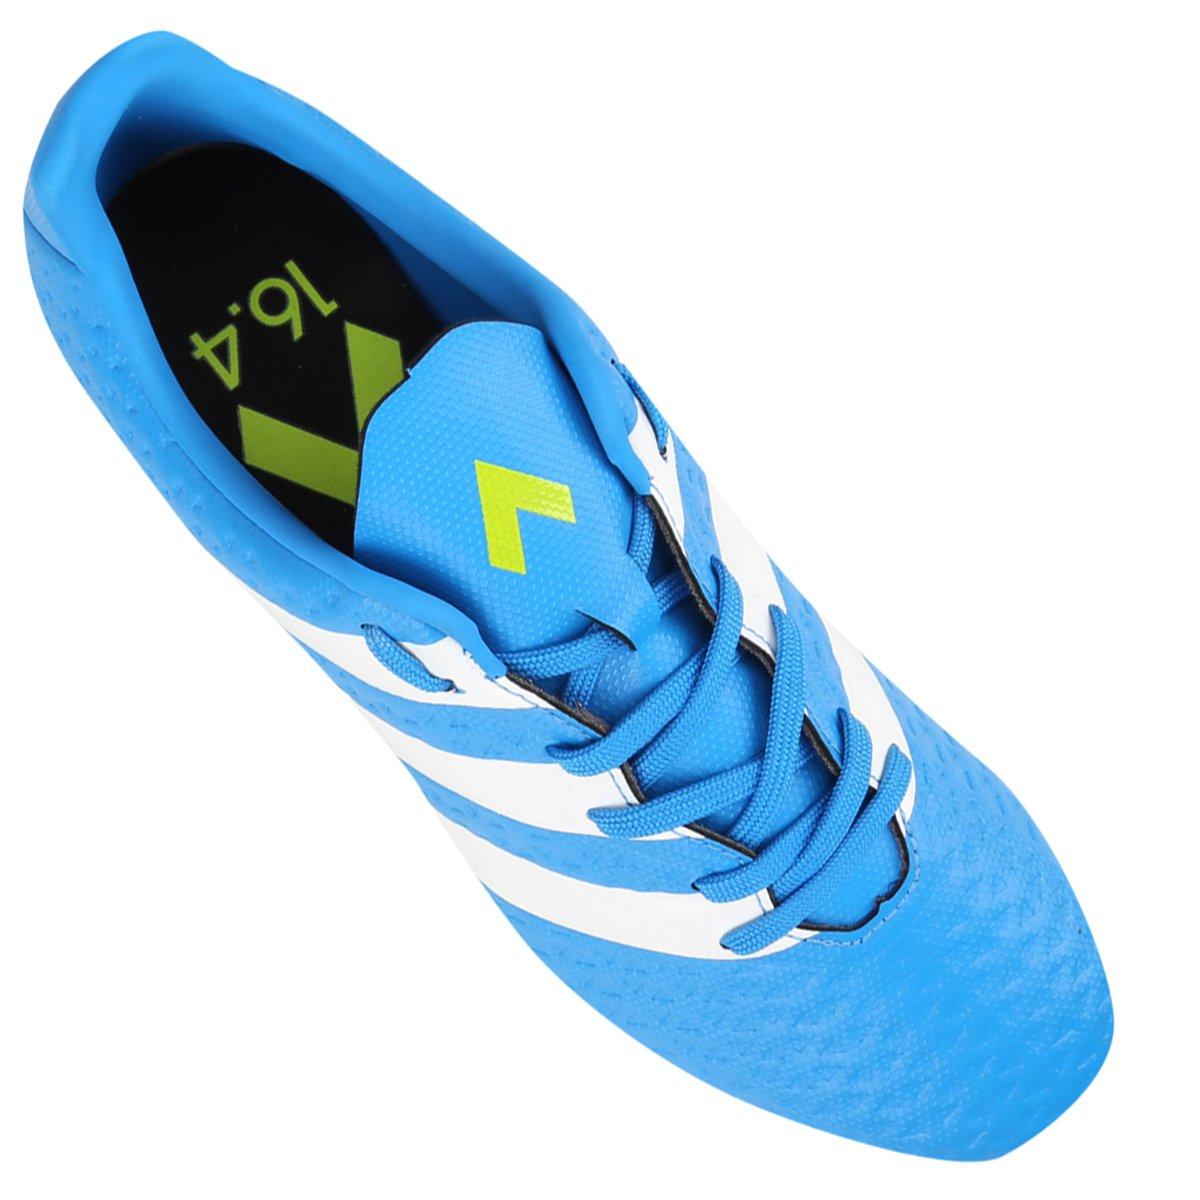 Chuteira Campo Adidas Ace 16.4 FXG Masculina - Azul Piscina e Verde ... 30f13faff05ab